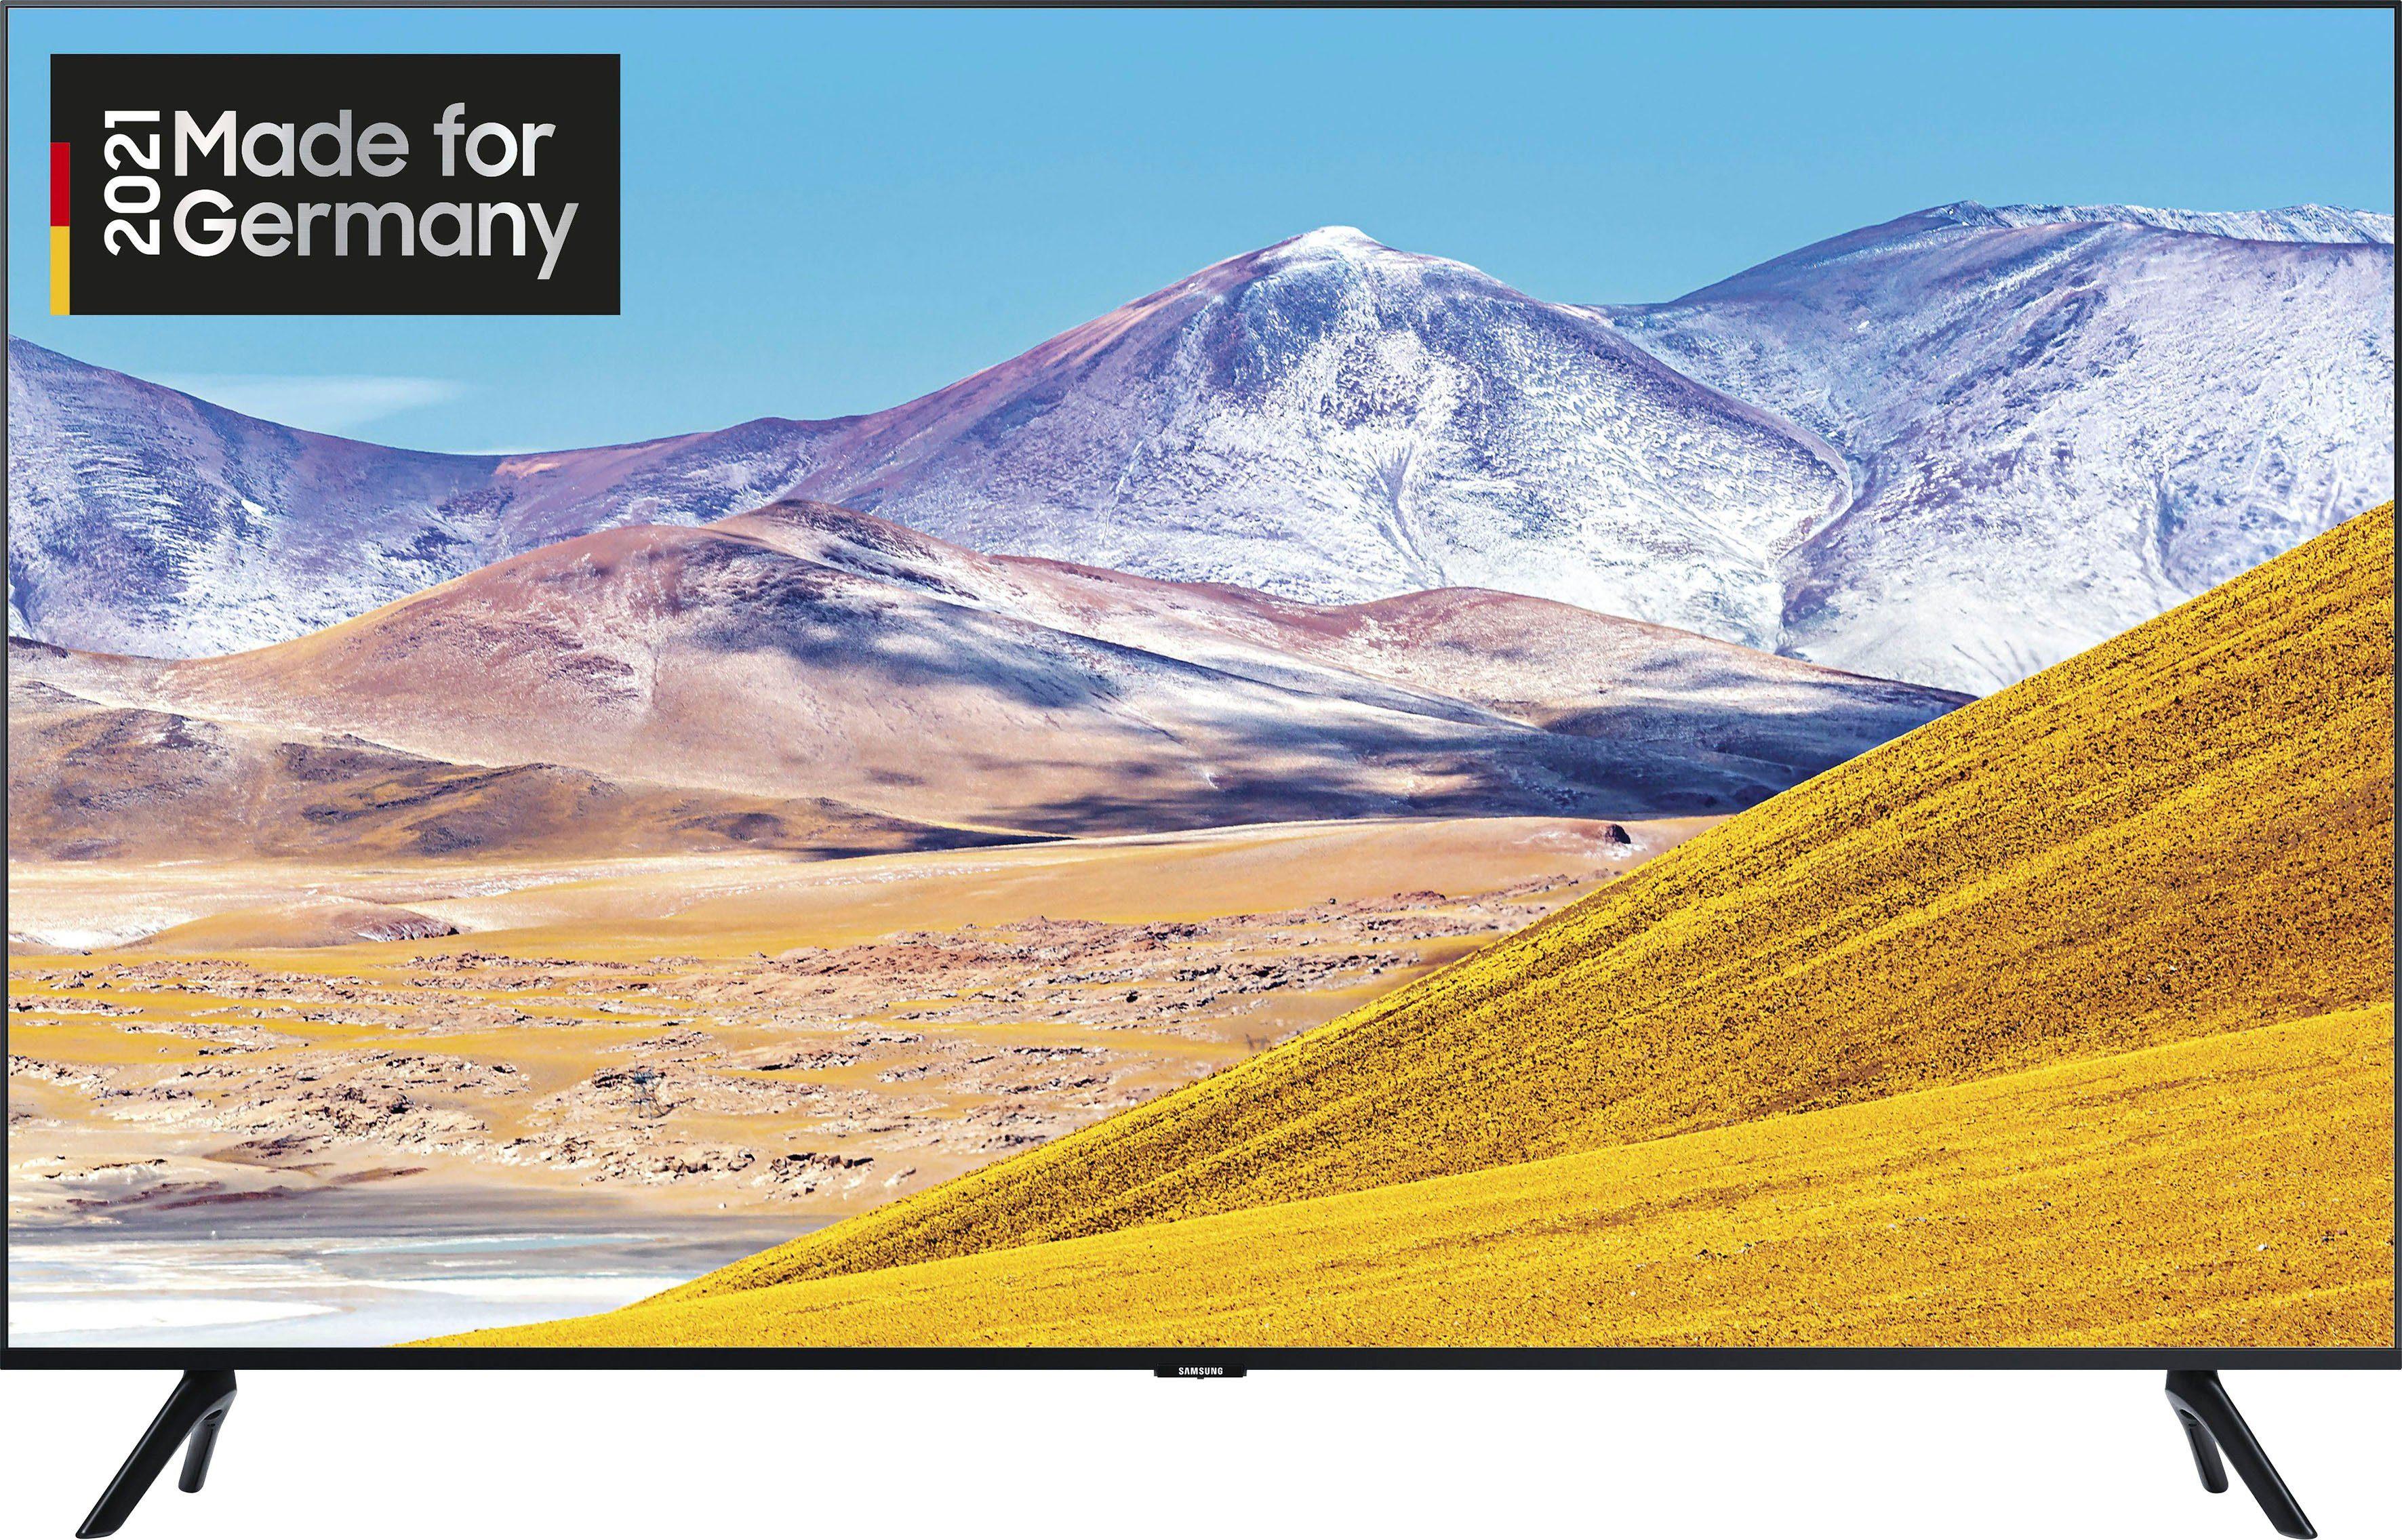 samsung gu50tu8079u led fernseher 125 cm 50 zoll 4k ultra hd smart tv